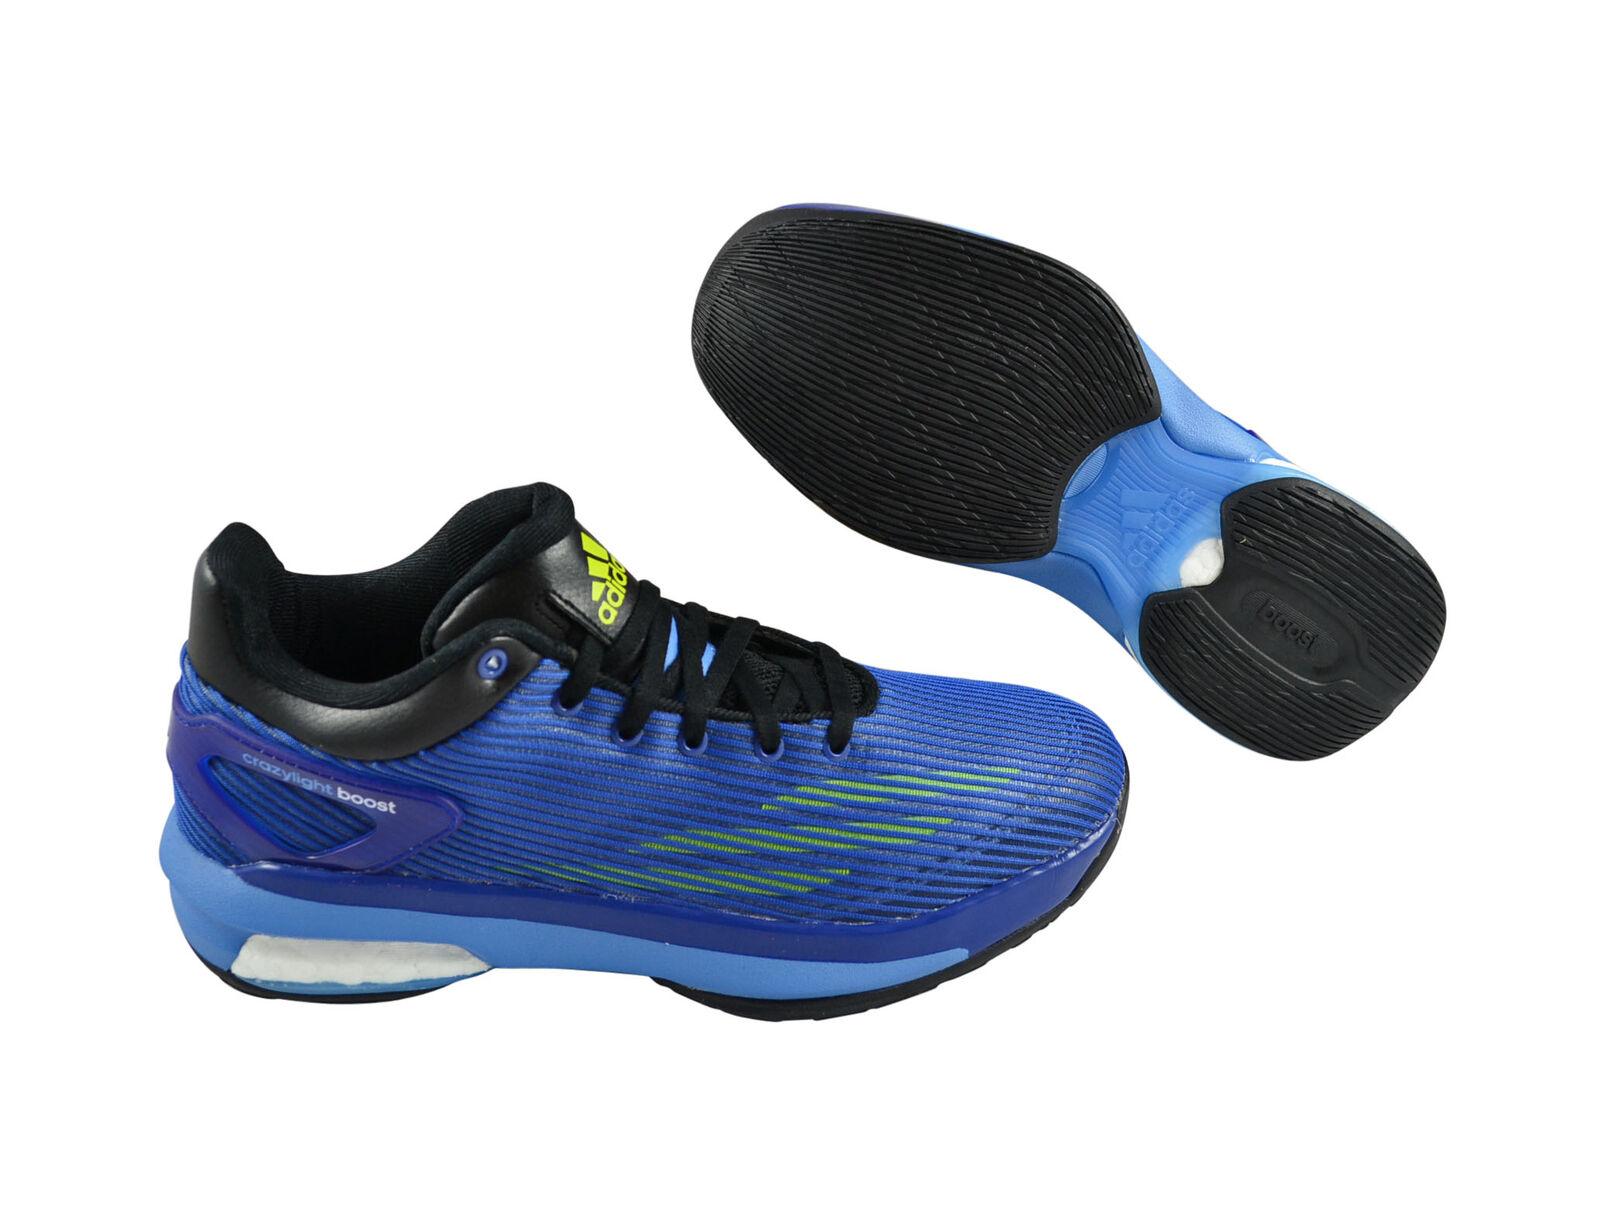 Adidas Crazylight Boost Low Schuhe Blau S83863 Basketballschuhe